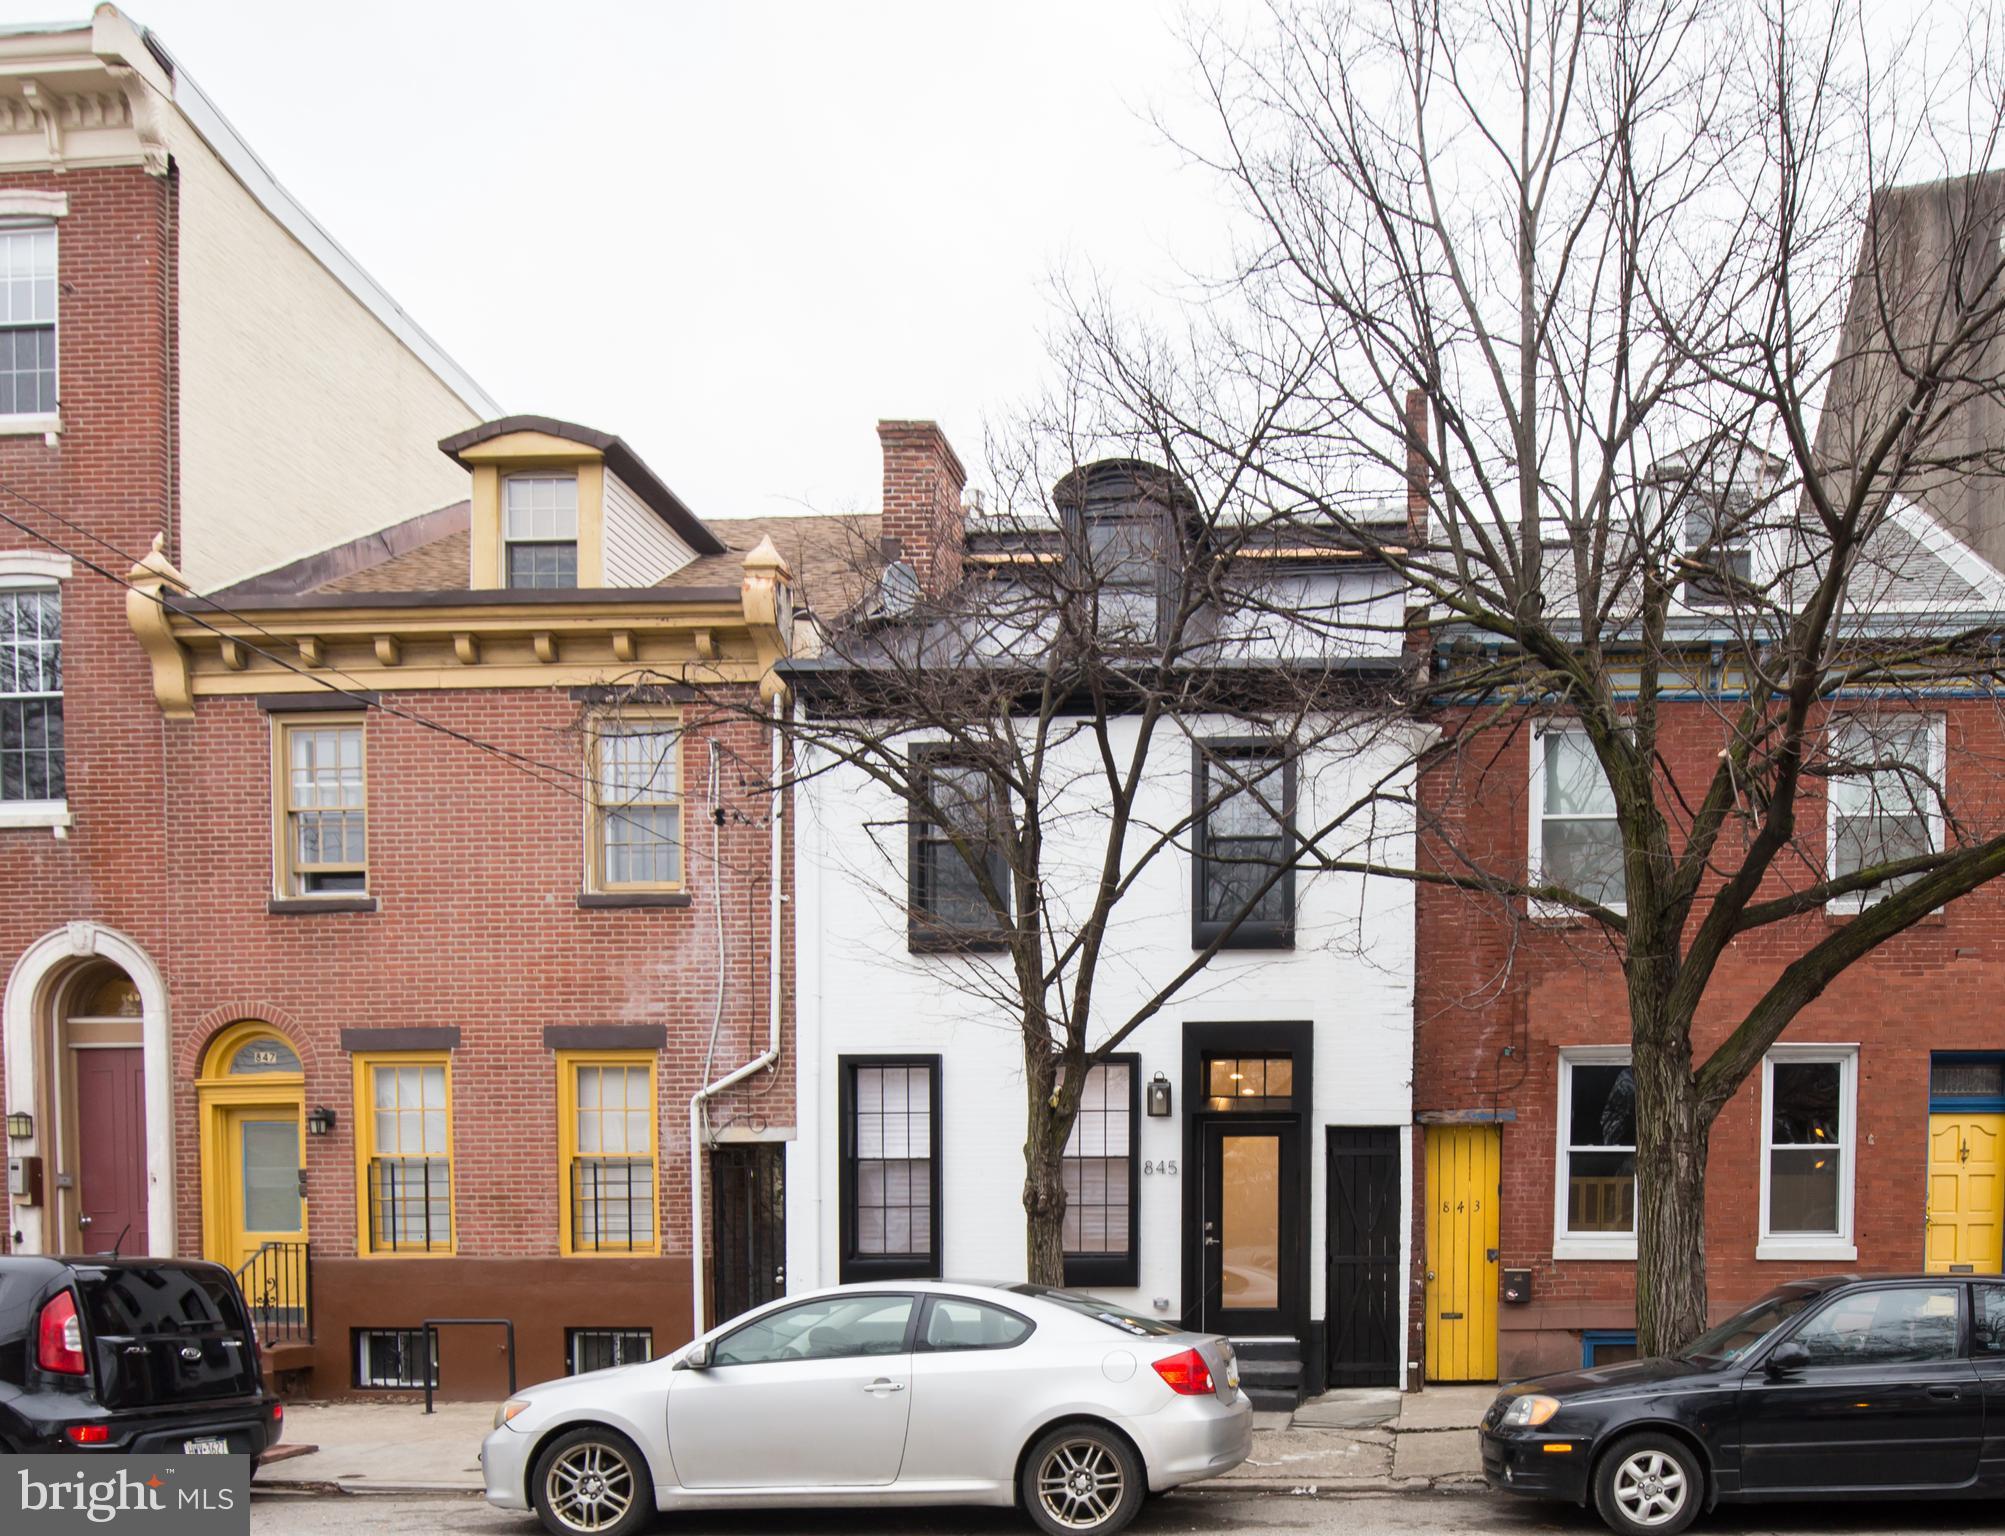 845 N 5th St, Philadelphia, PA, 19123